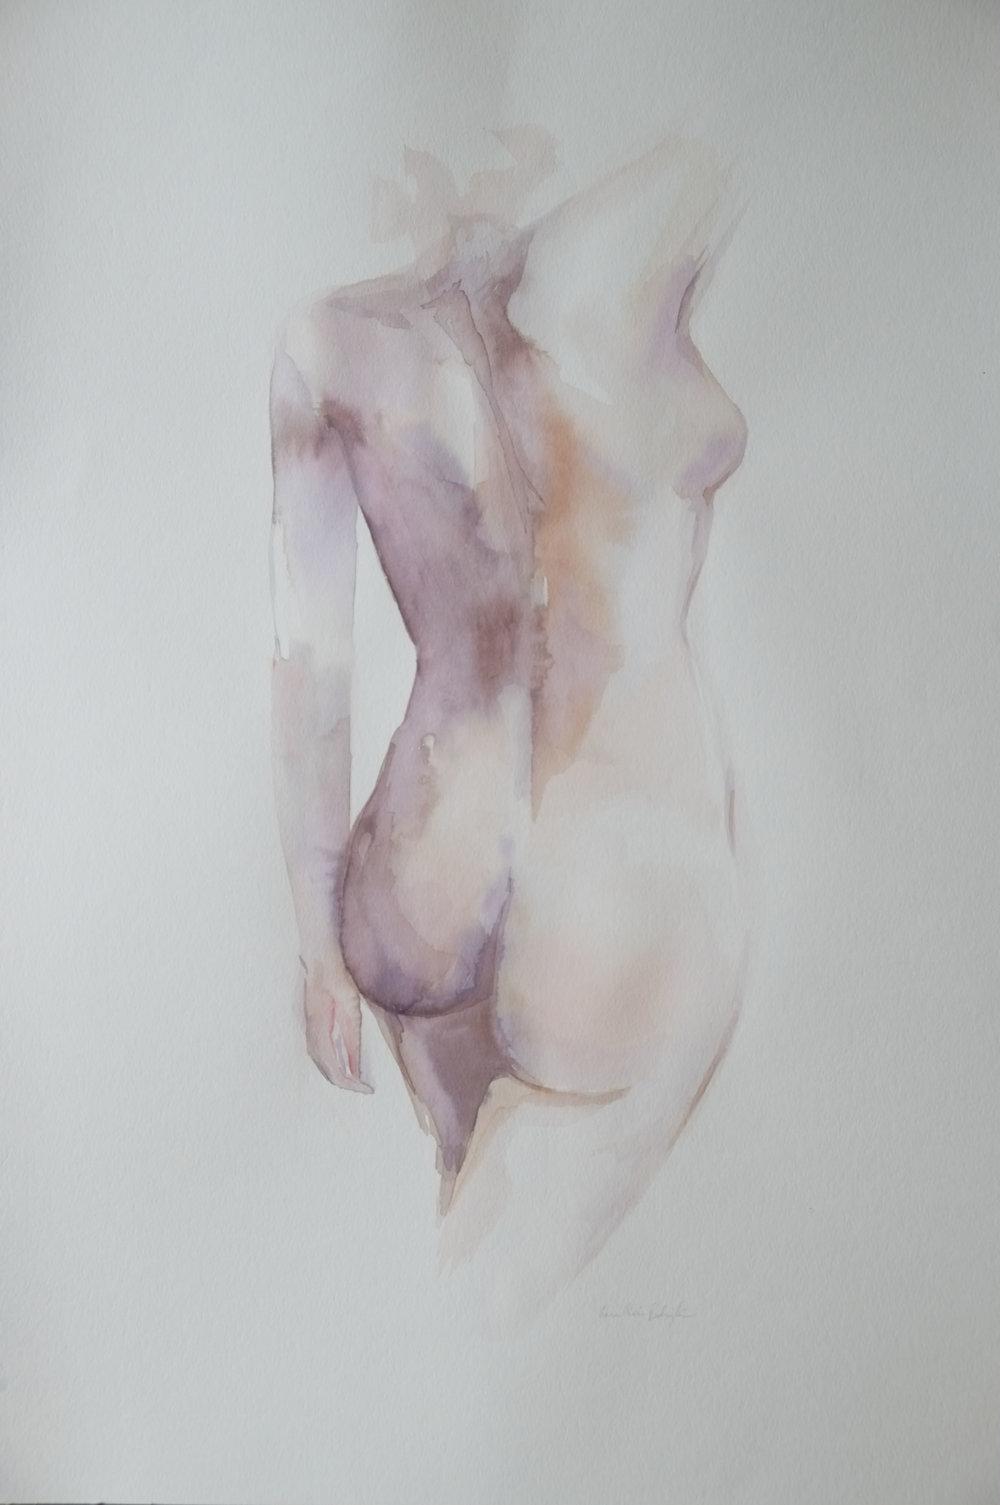 painting_april2017_0064_363.JPG